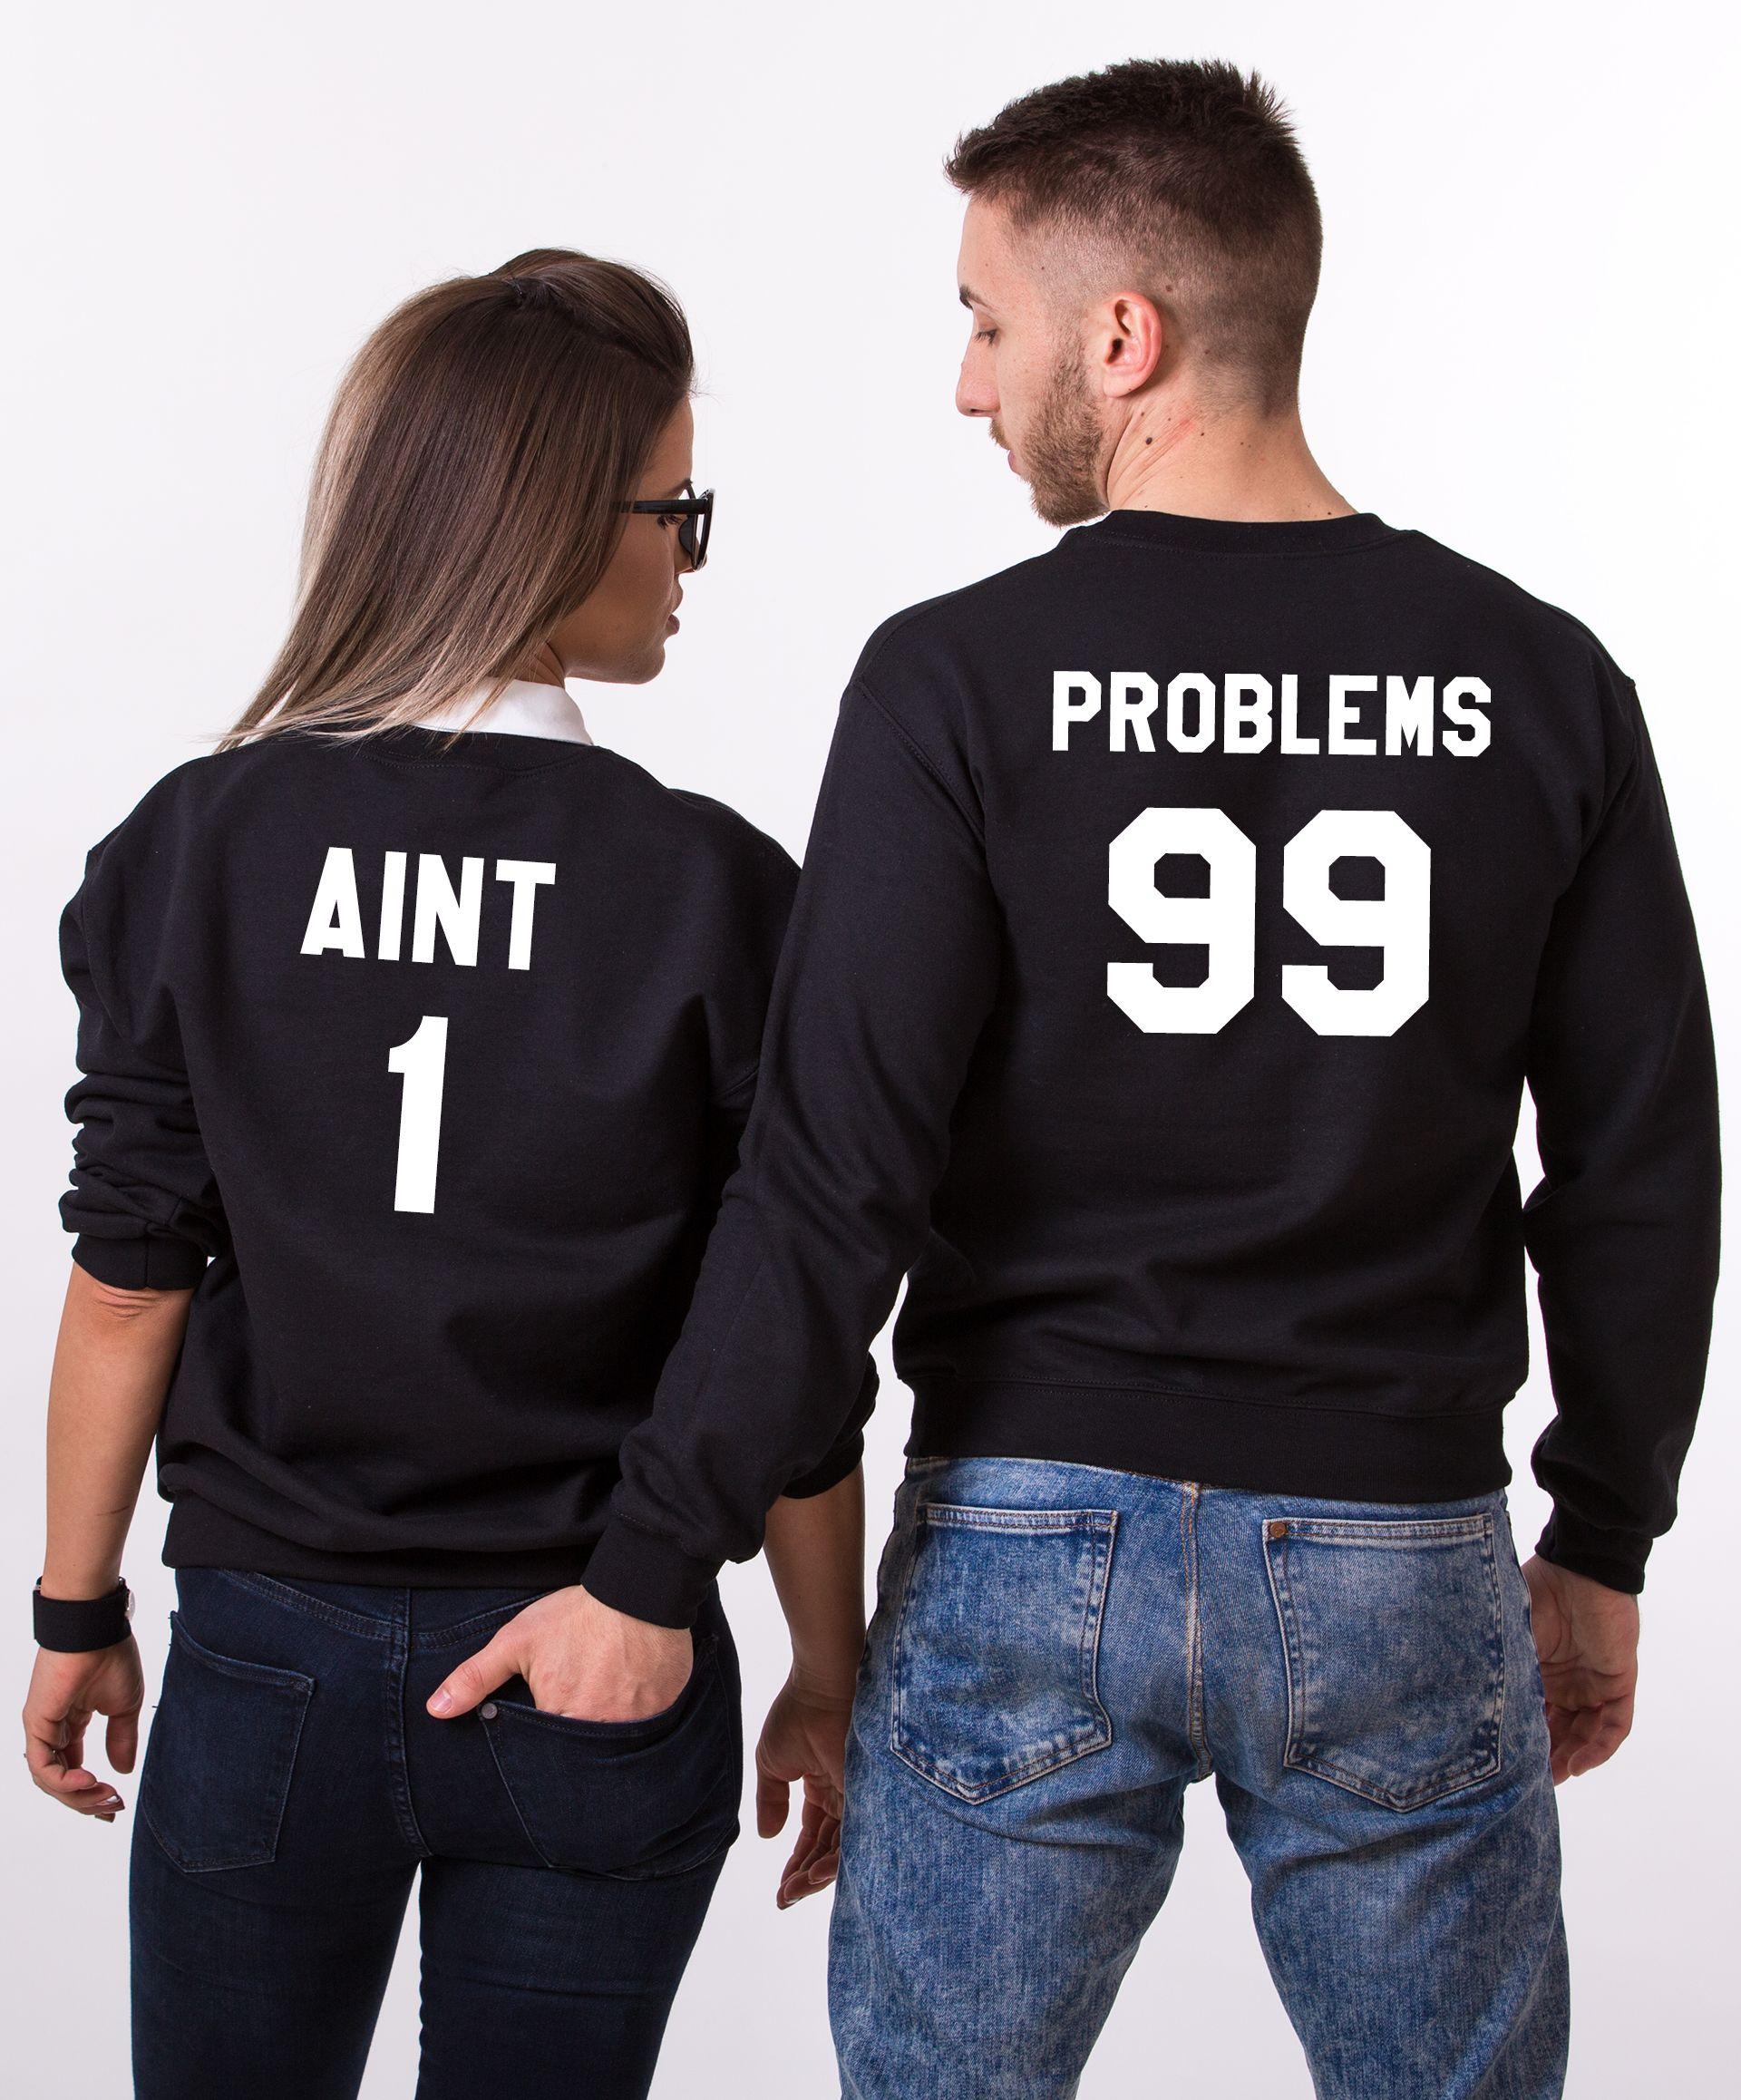 4f25b63d4f 99 Problems Sweatshirt, Aint 1 Sweatshirt, Matching Couples Sweatshirts